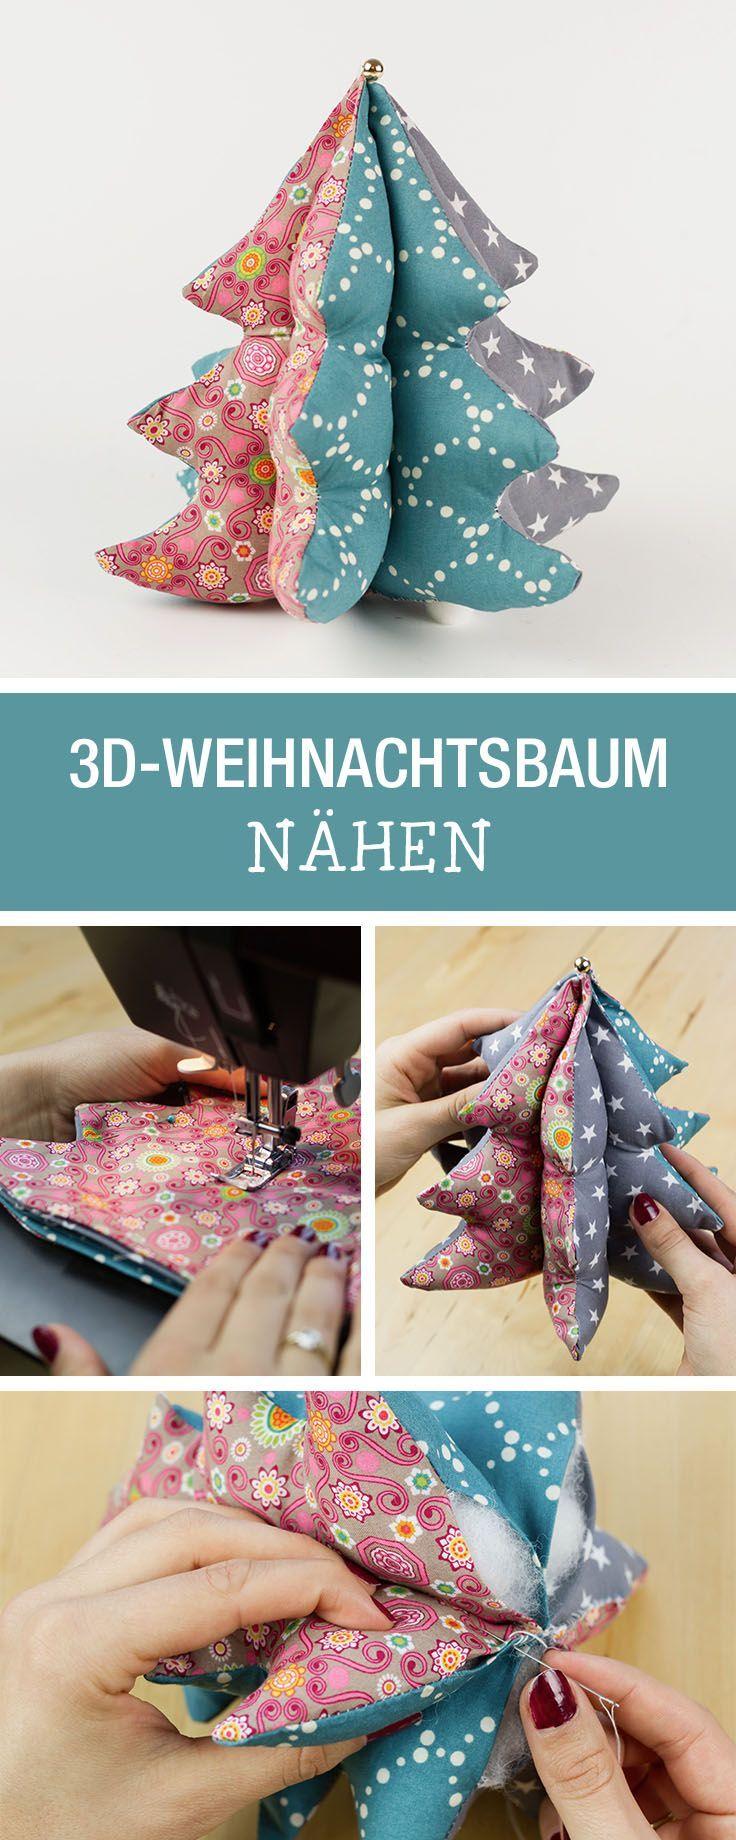 DIY-Anleitung: Patchwork-Deko-Weihnachtsbaum nähen via DaWanda.com ...